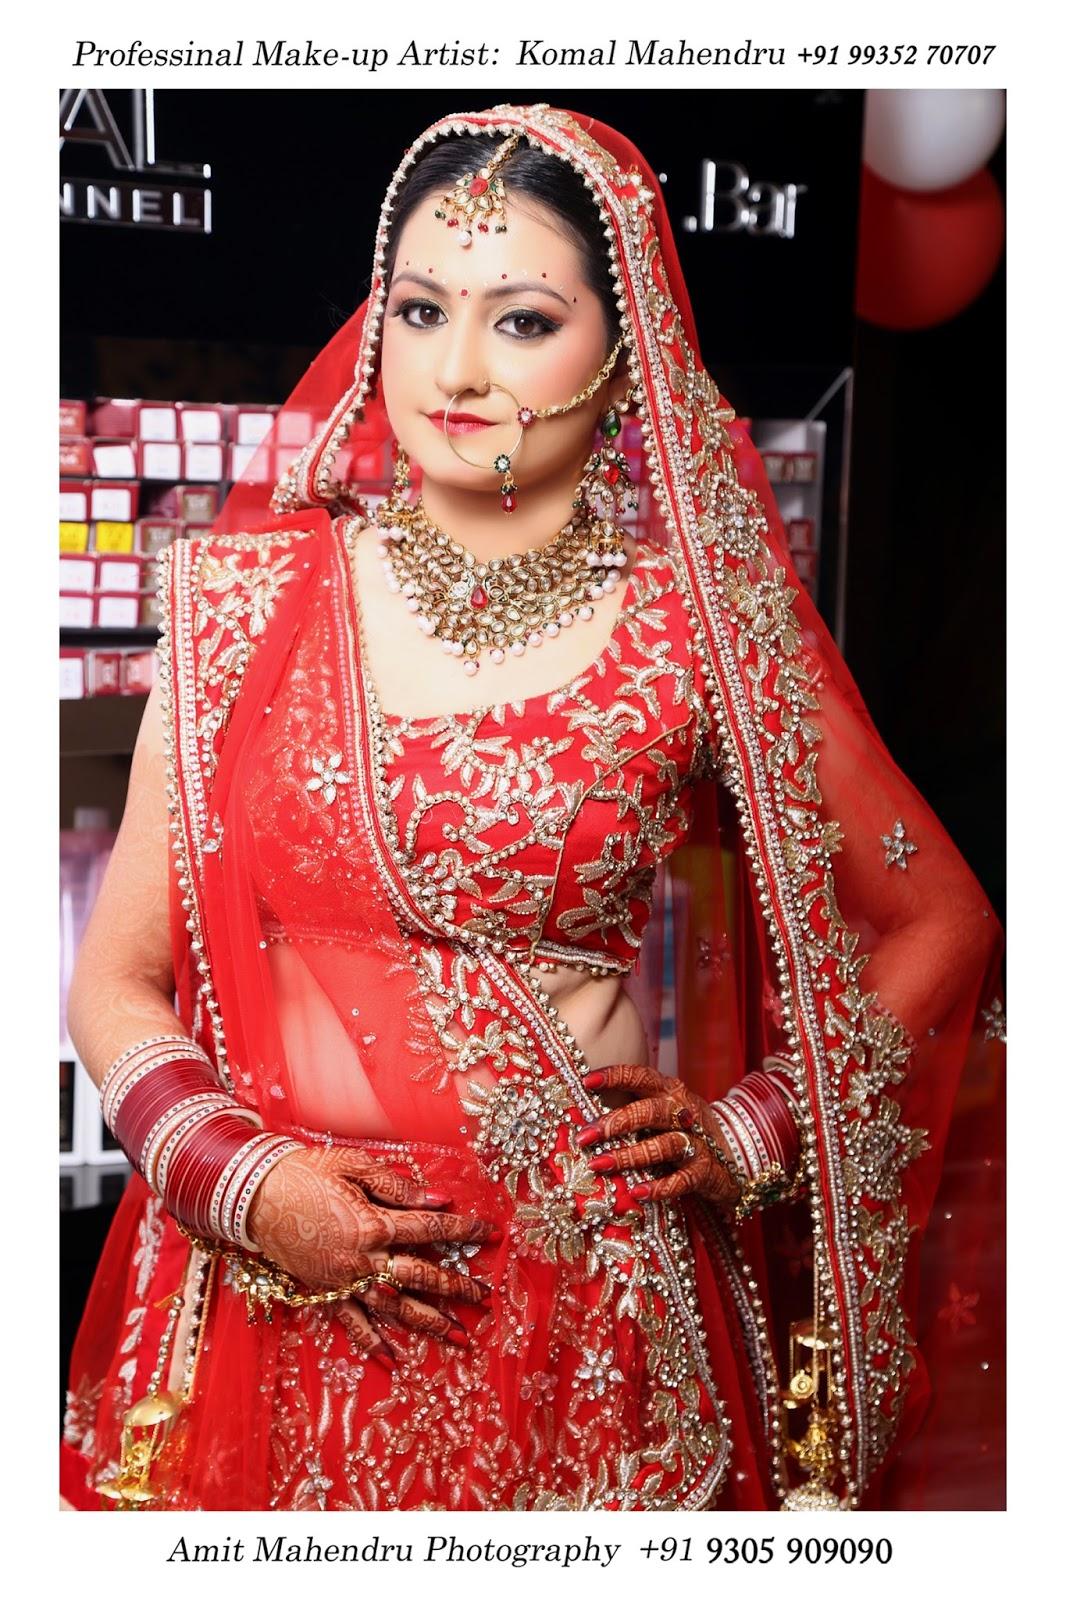 Komal mahendru s professional makeup lucknow india bridal makeup - Best Bridal Makeup Artist In Lucknow By Komal Mahendru